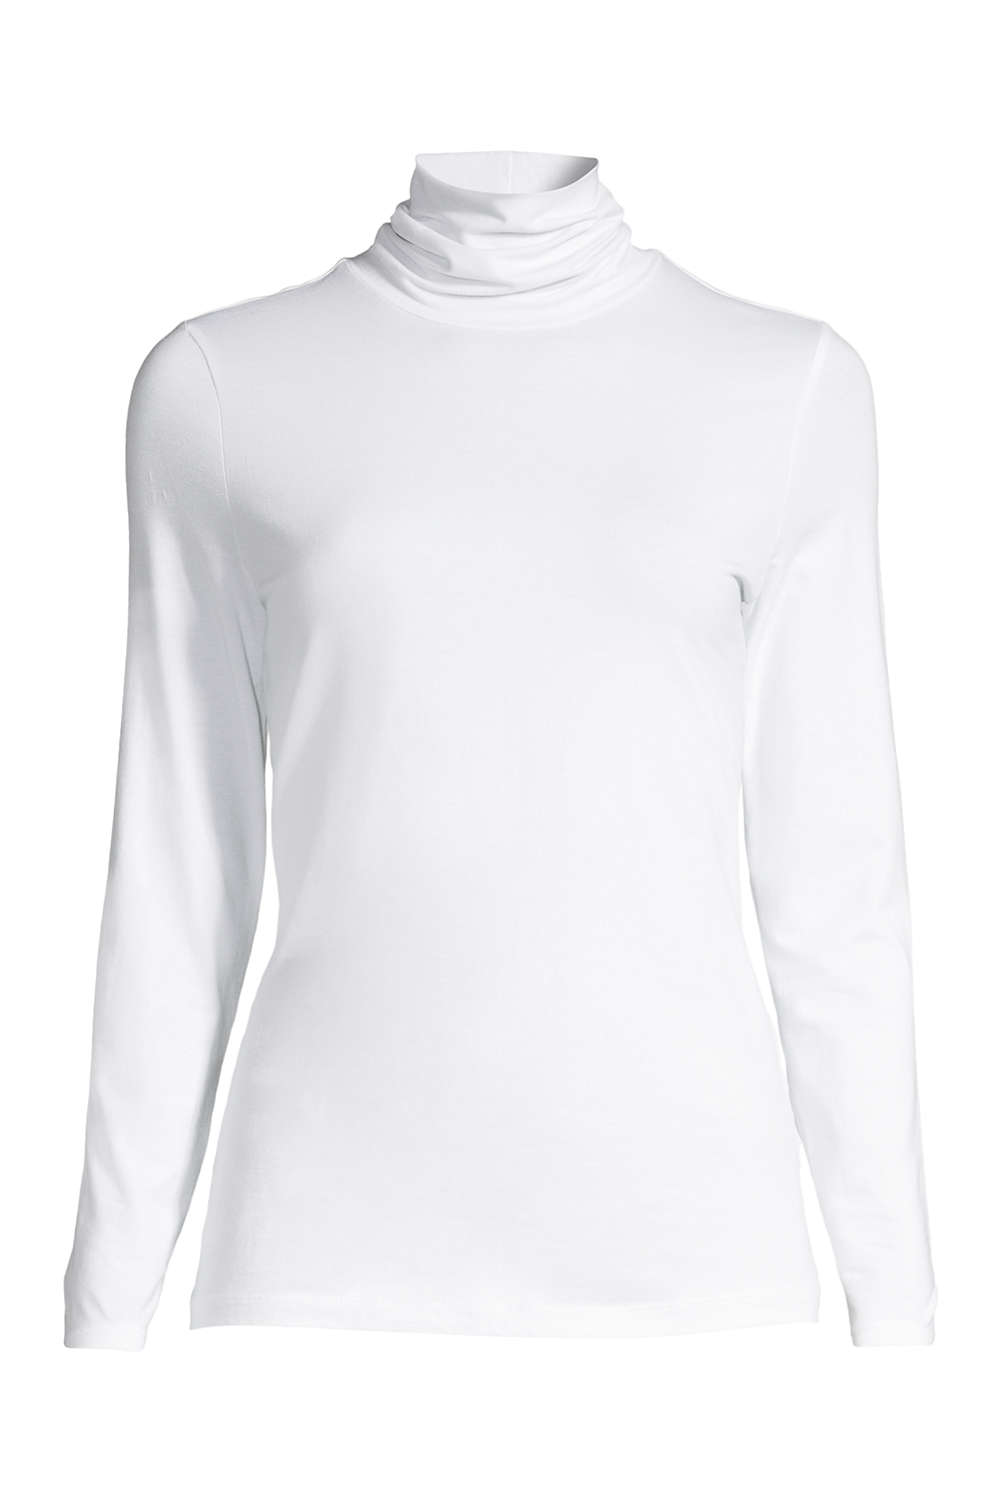 6276380d7e4d83 School Uniform Women s Shaped Layering Turtleneck from Lands  End